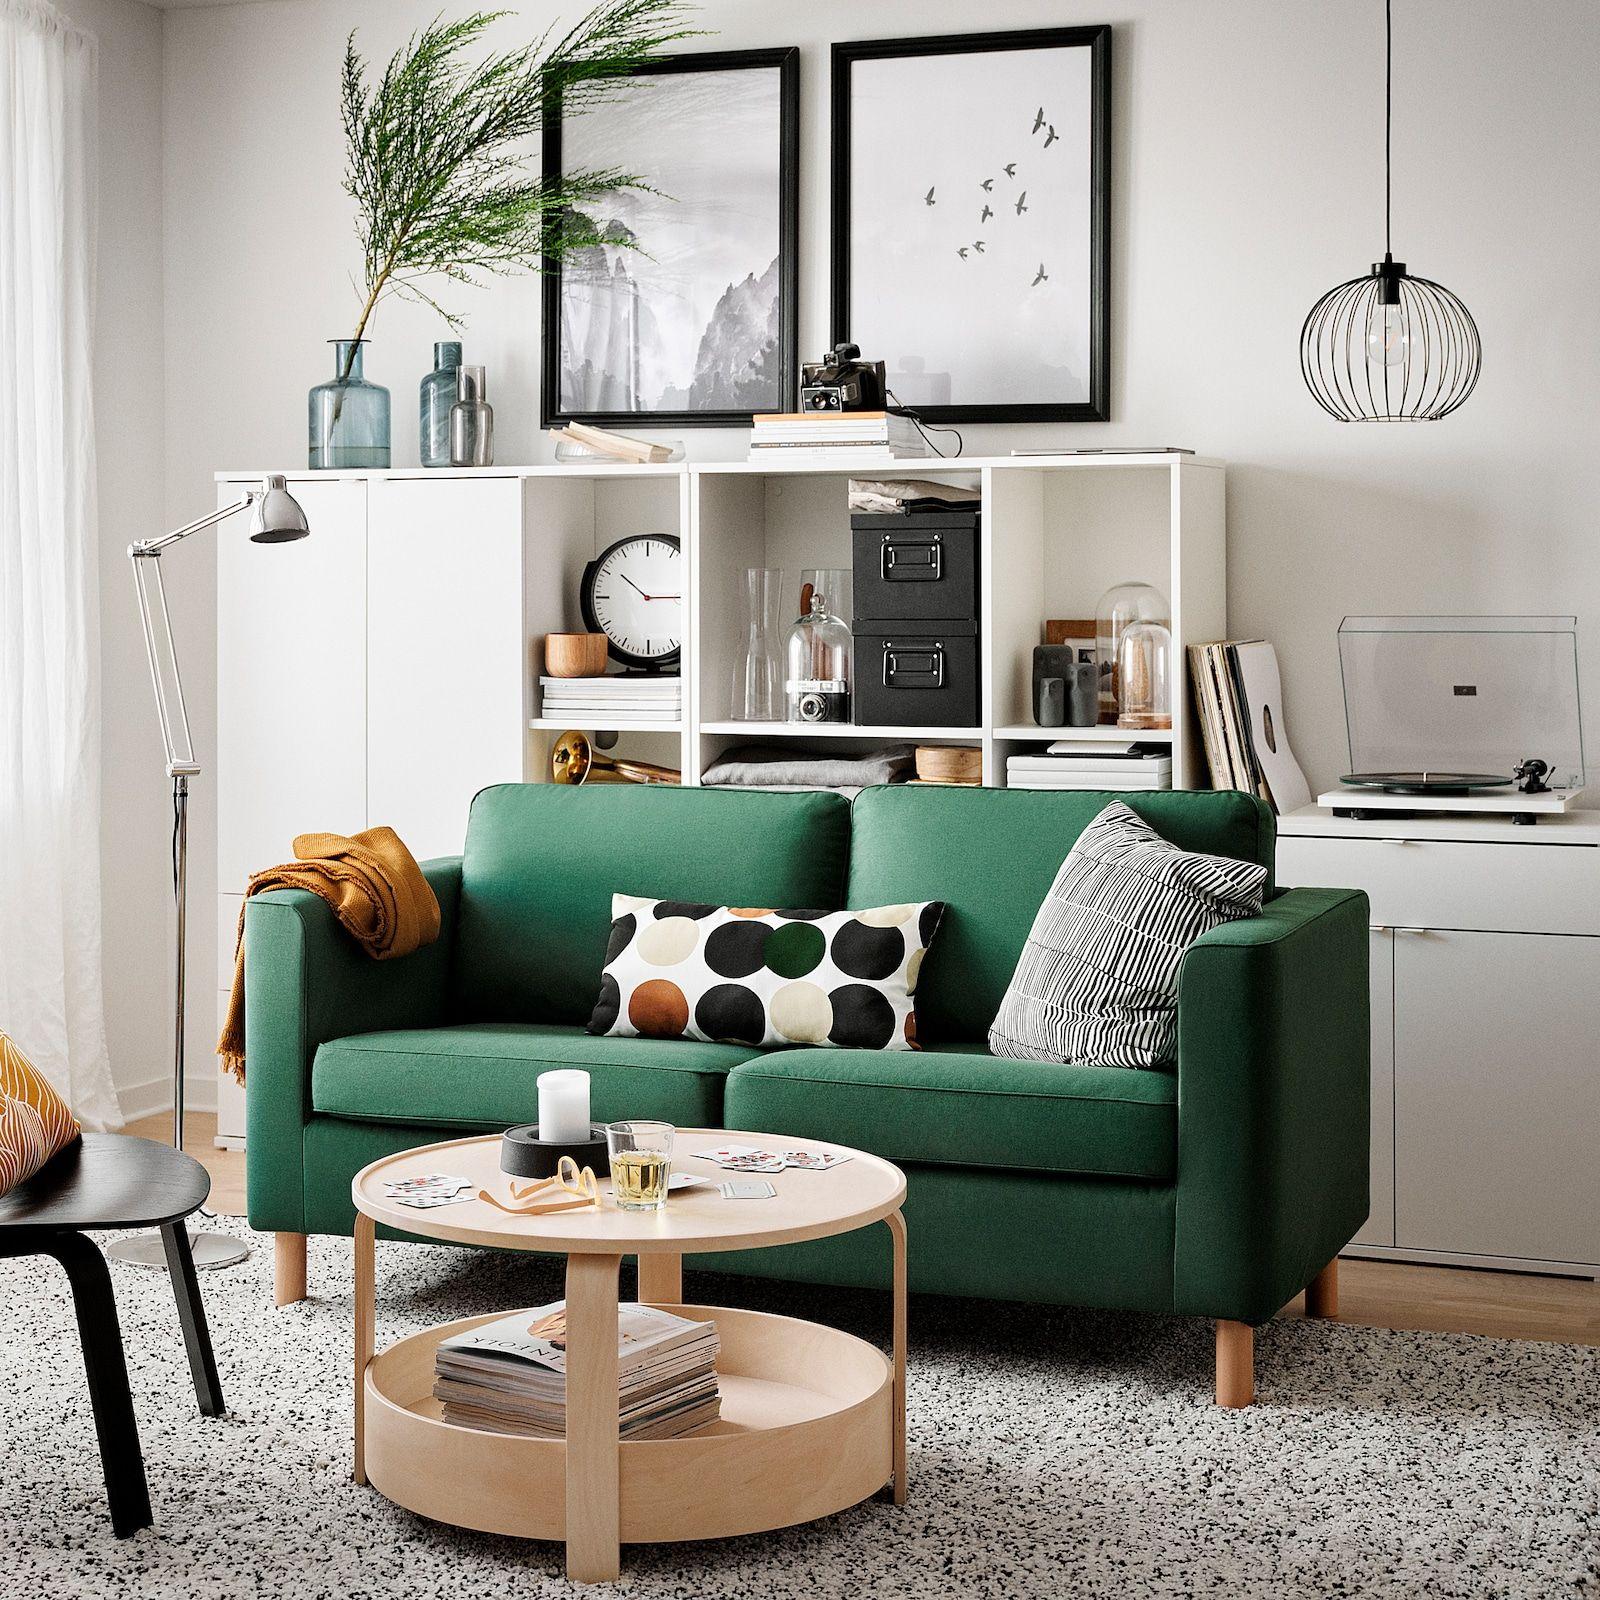 Borgeby Bord Bjorkefiner 70 Cm Ikea In 2021 Living Room Table Coffee Table Ikea [ 1600 x 1600 Pixel ]